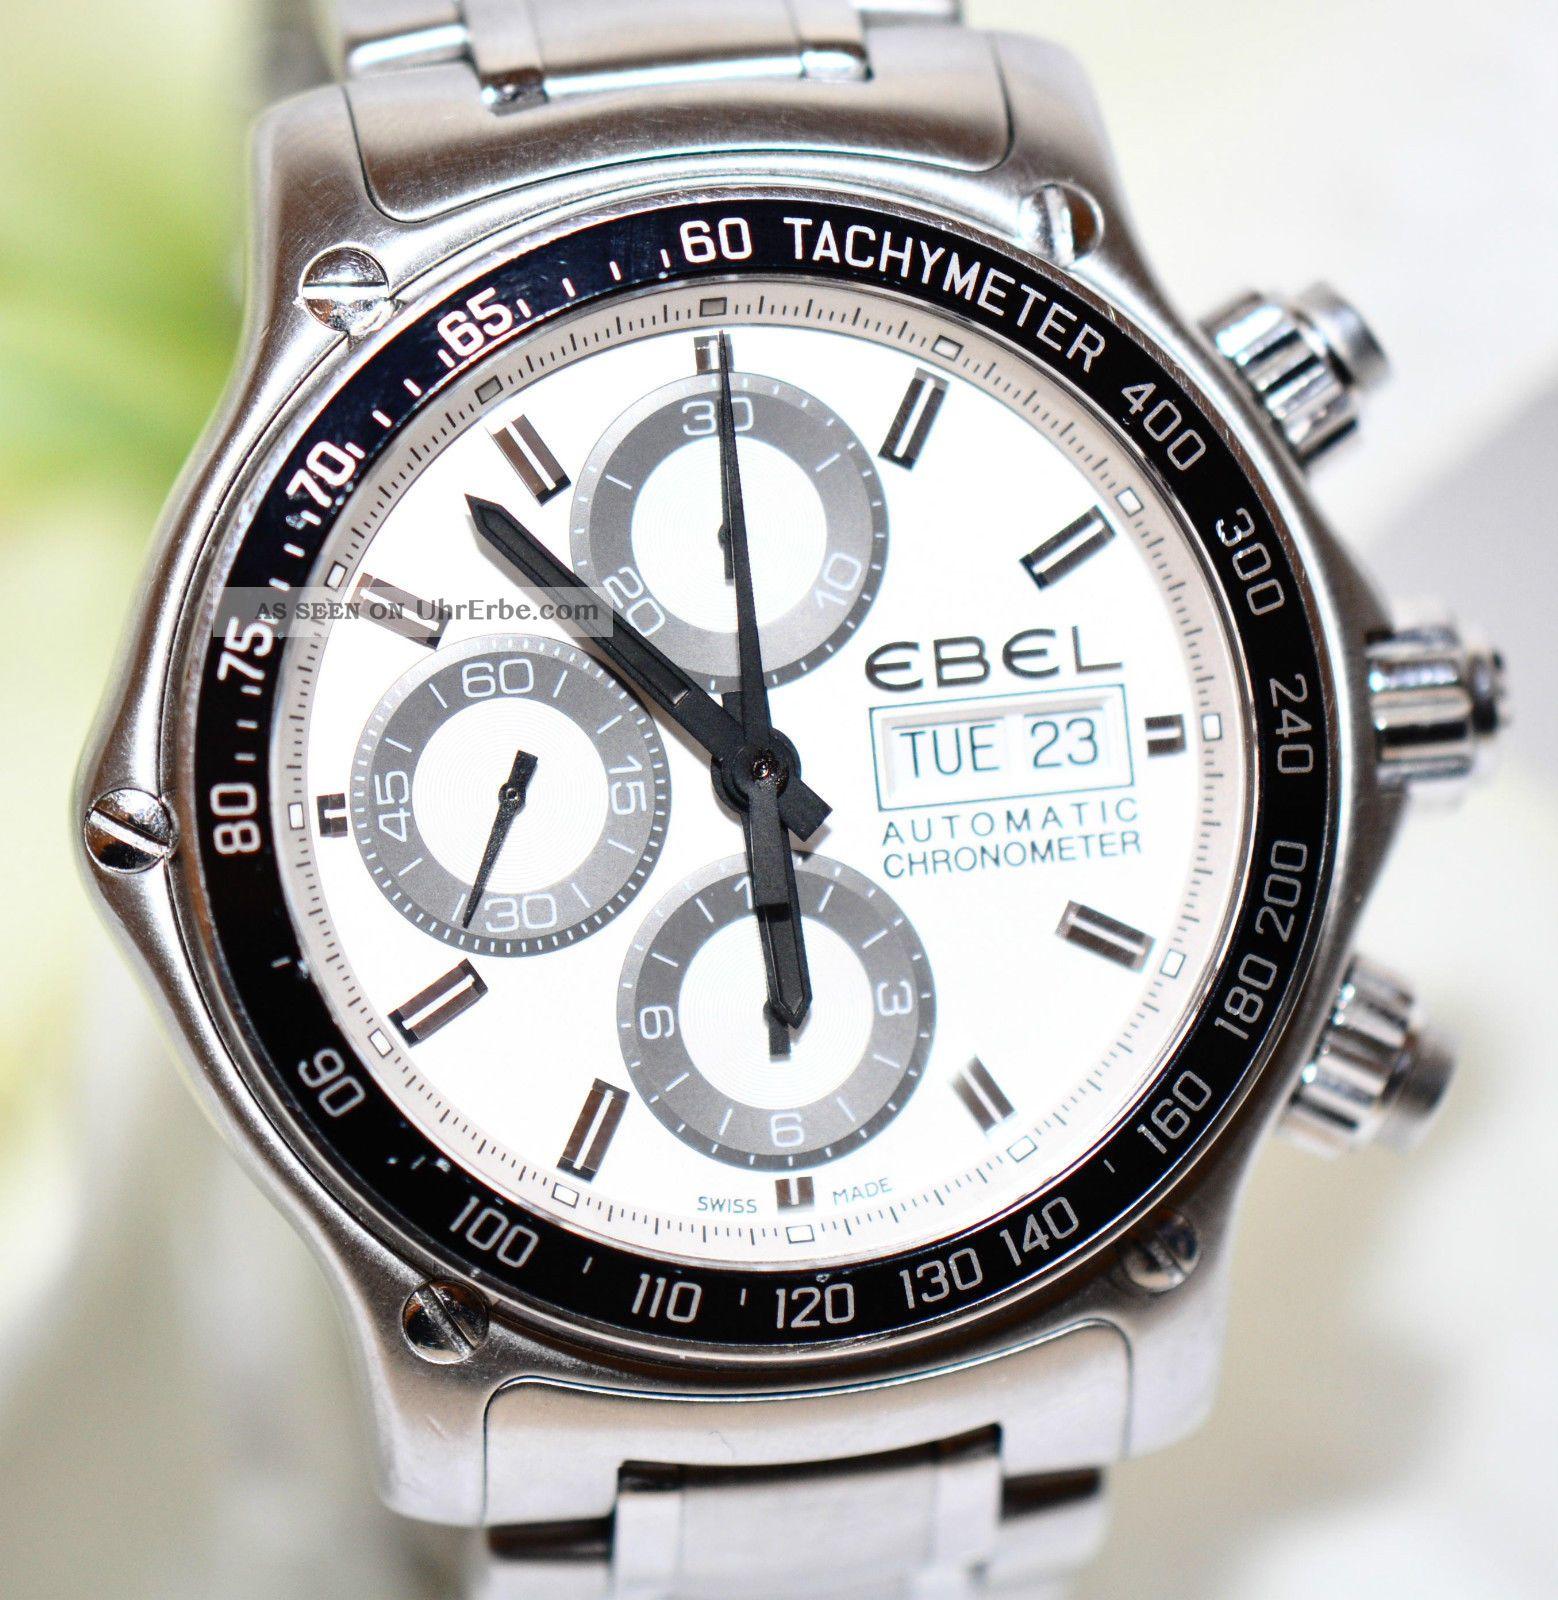 Ebel Chronograph Stahl Uhr 1911 Discovery Chronometer Ref.  1215795 Papiere 2013 Armbanduhren Bild